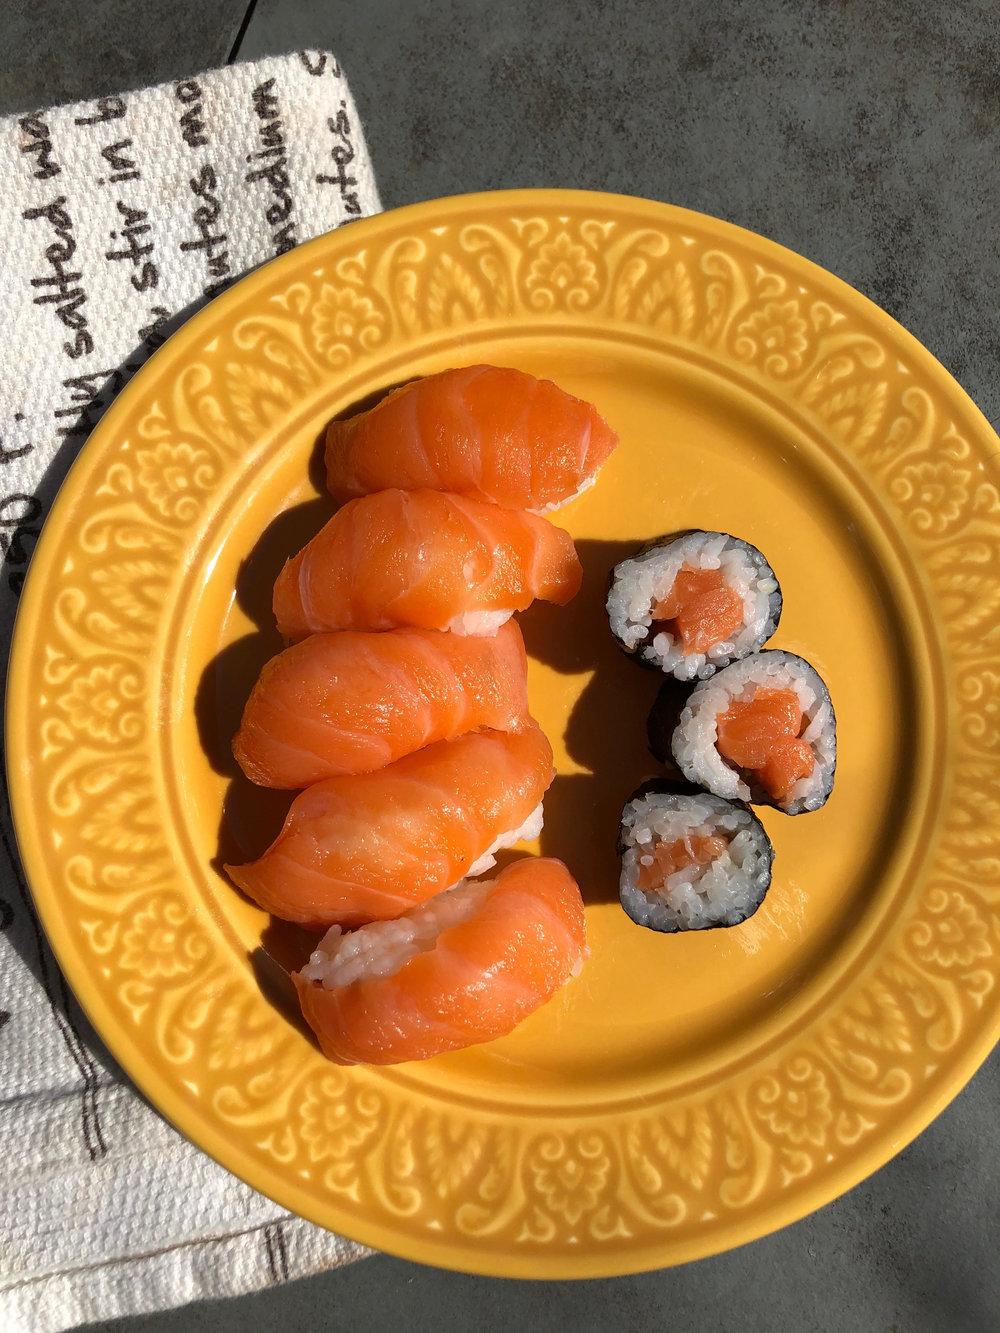 Sushi and sashimi are favorites!